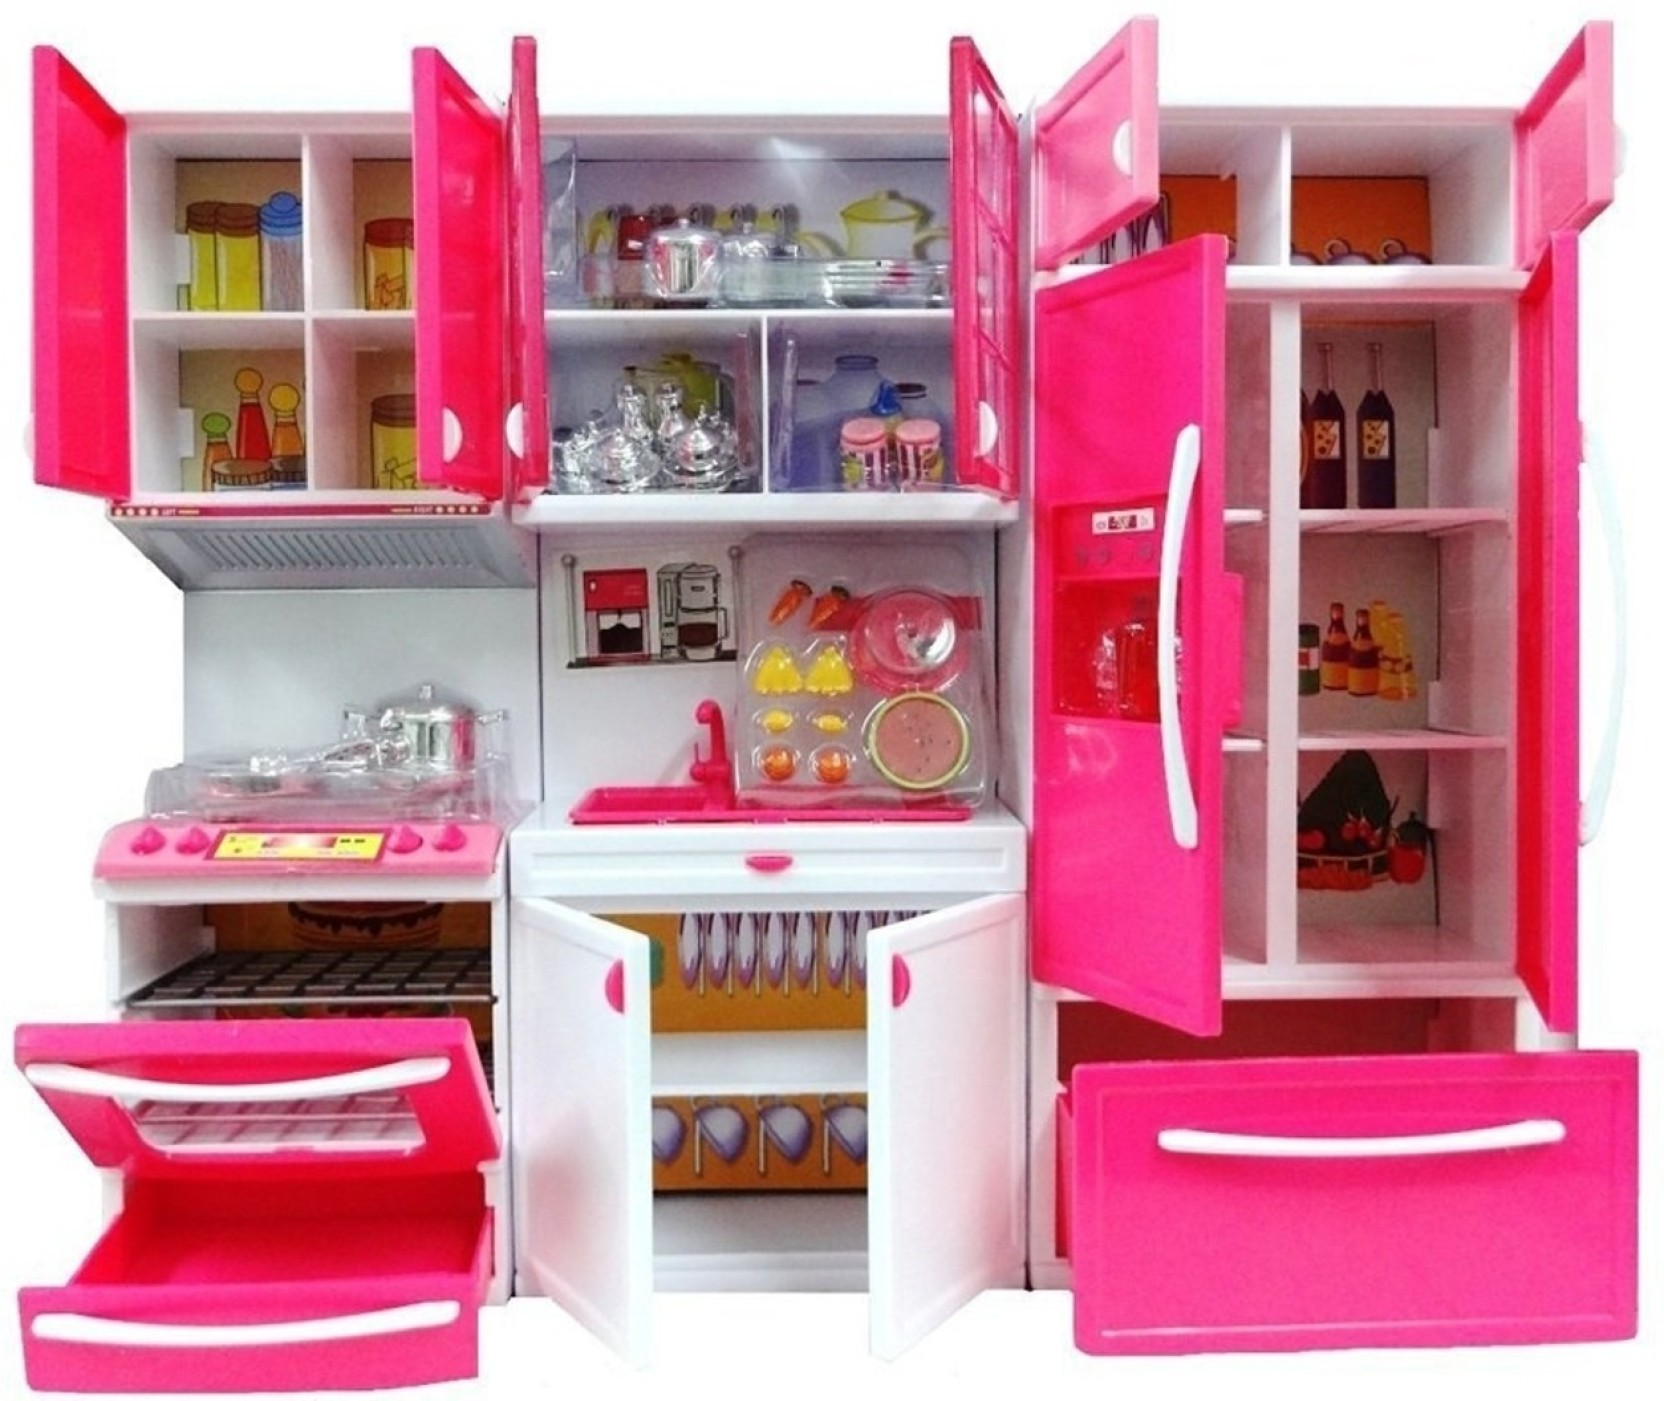 Kris toy pink stylish modular kitchen set for girls on offer